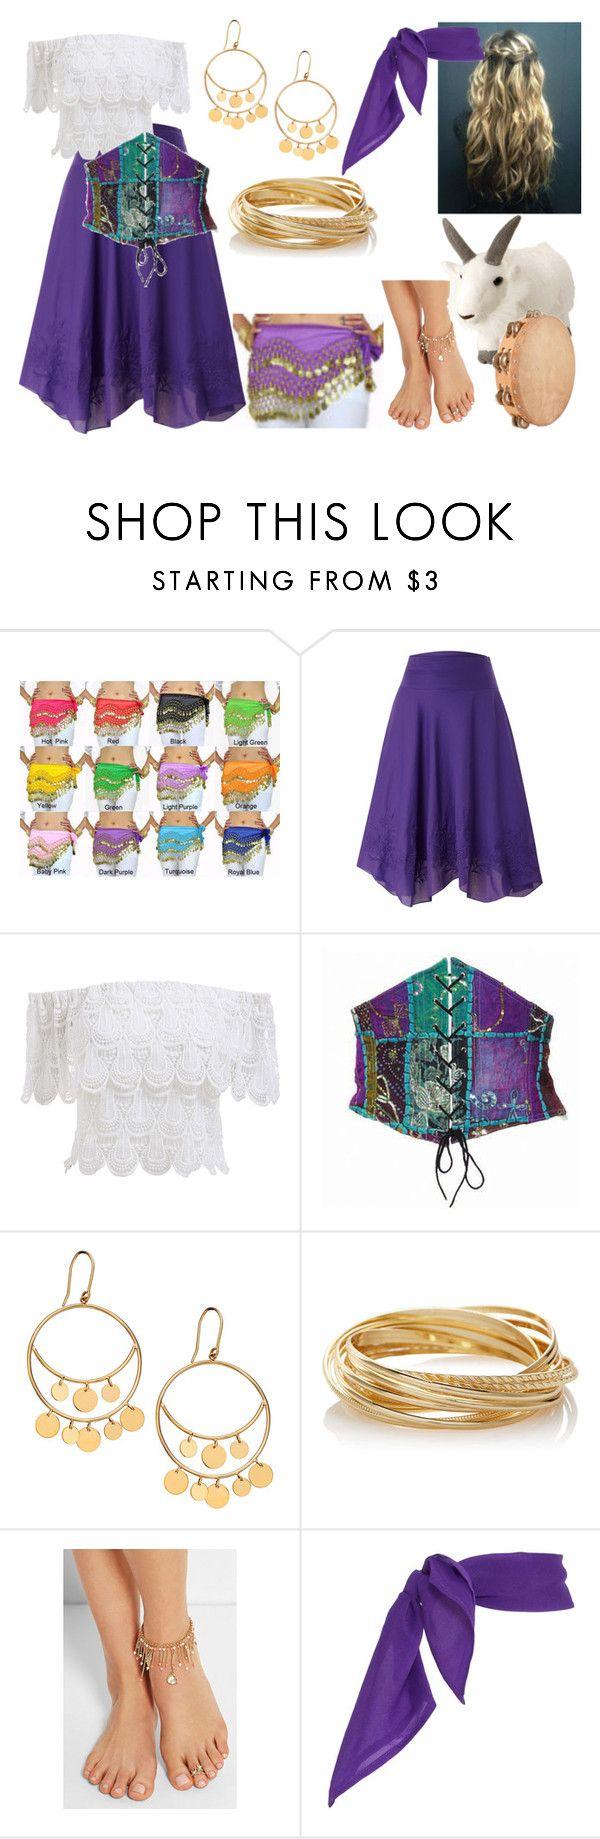 Esmeralda Costume · A Full Costume · Dressmaking on Cut ... |Diy Esmeralda Costume